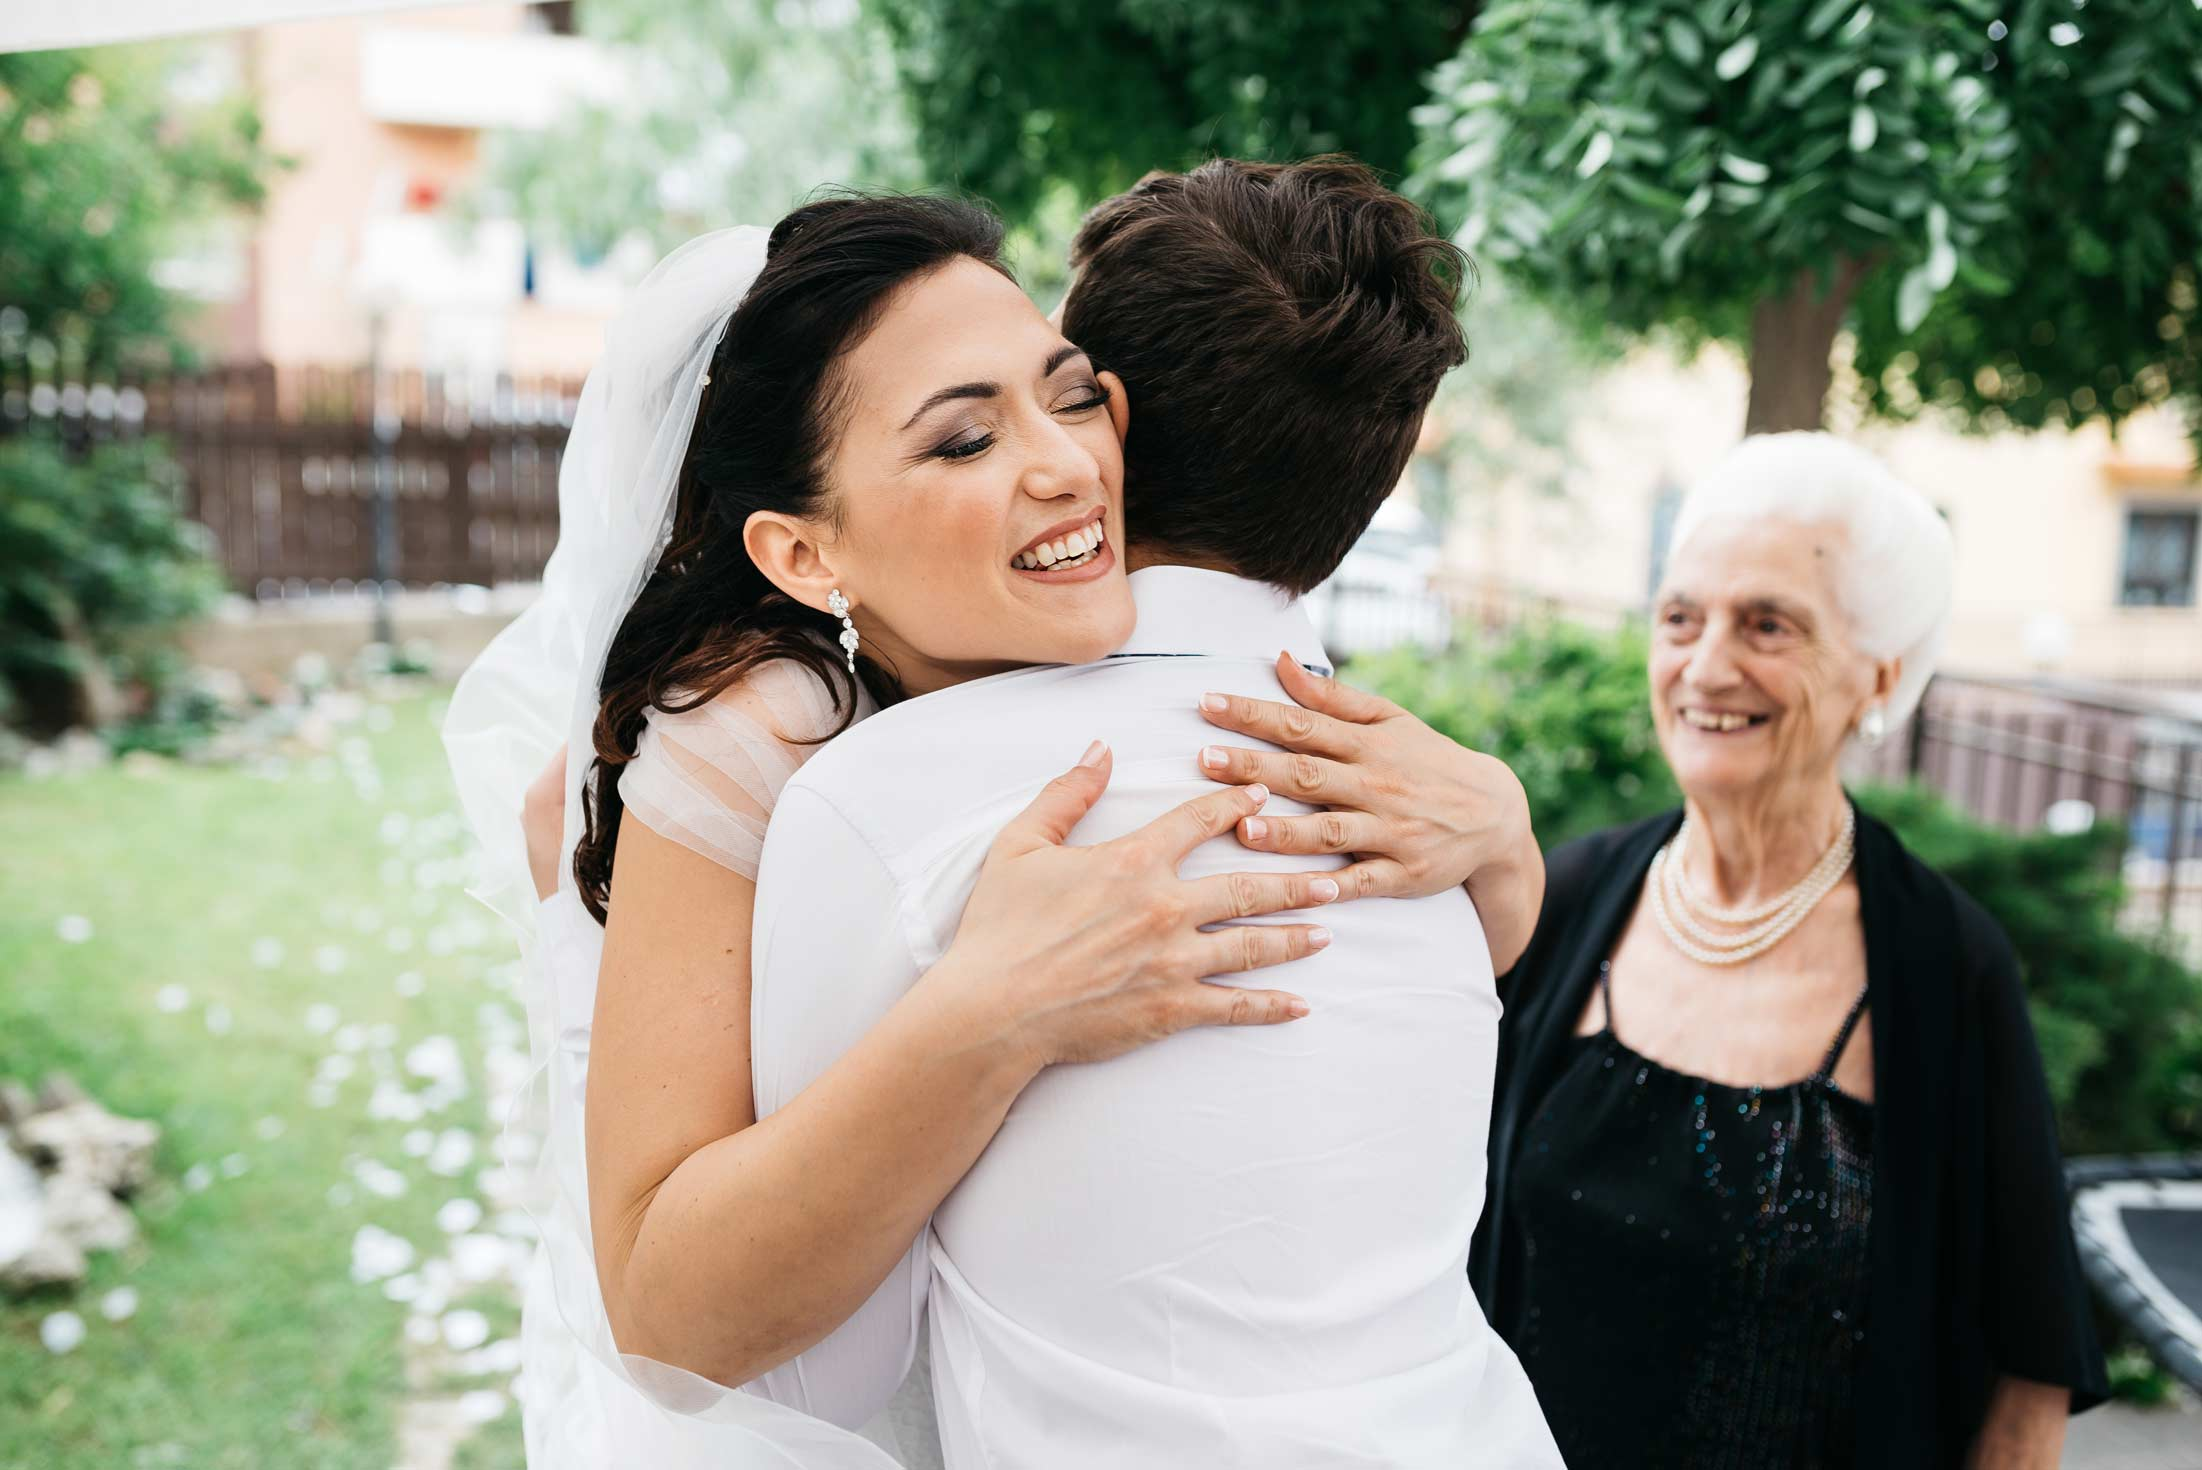 Fotografo-Reportage-Matrimonio-Preparativi-Sposa